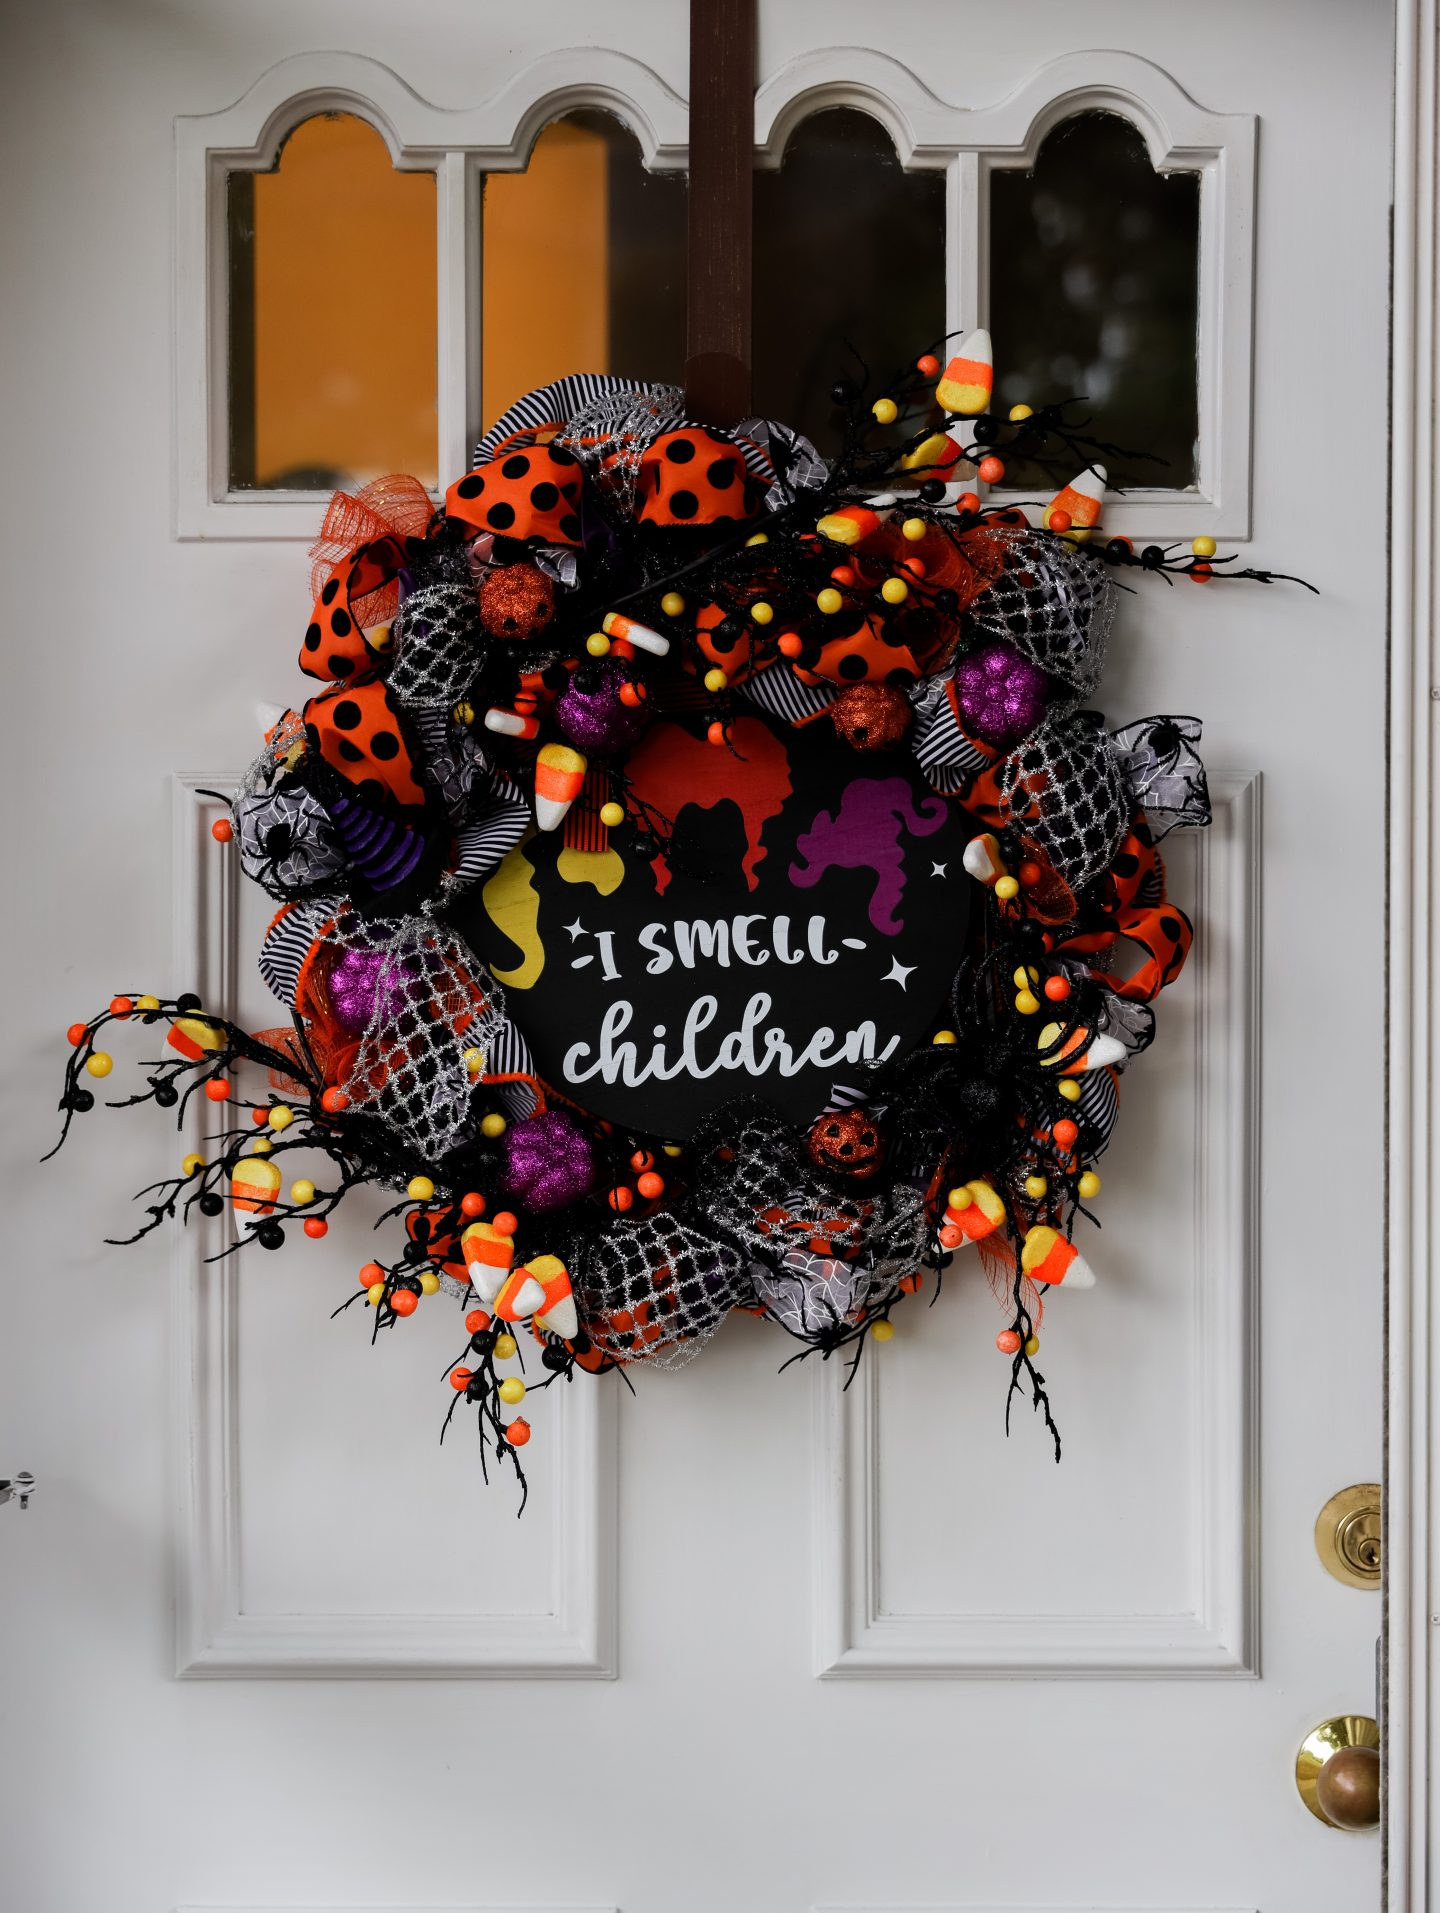 Hocus Pocus Wreath DIY for Halloween